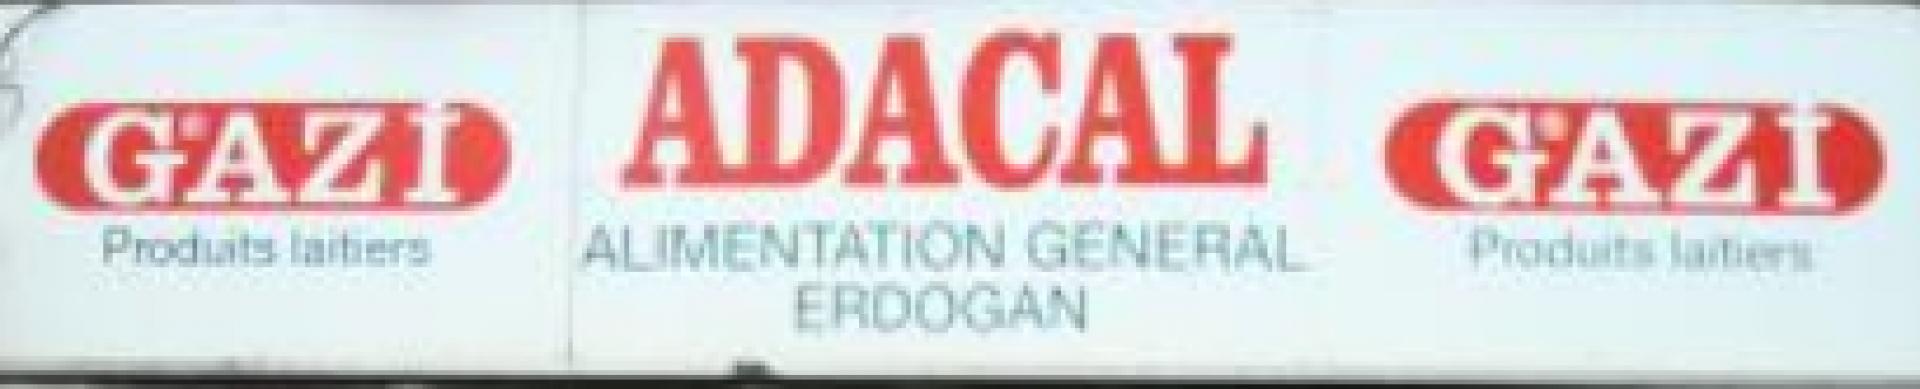 Adacal